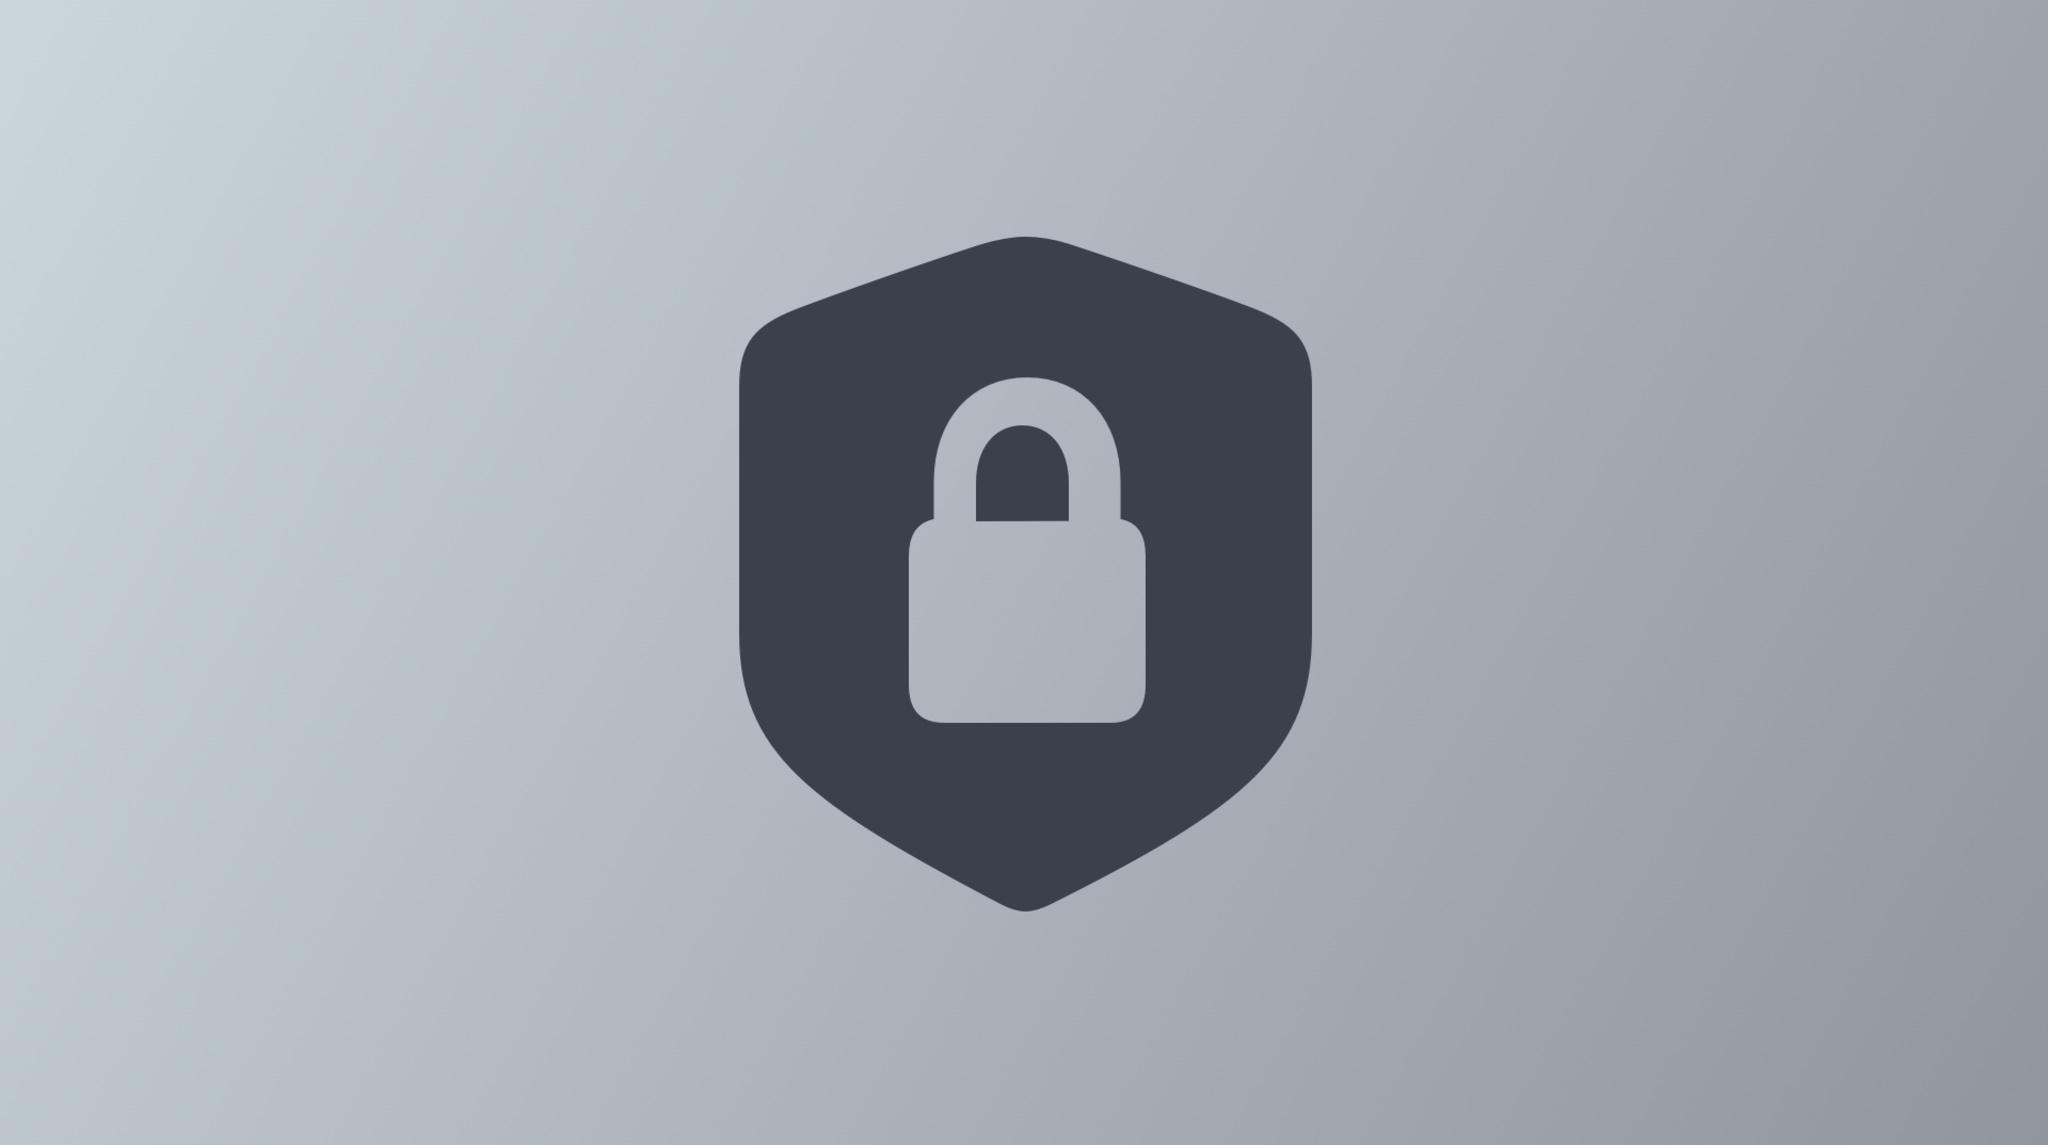 Locked shield icon